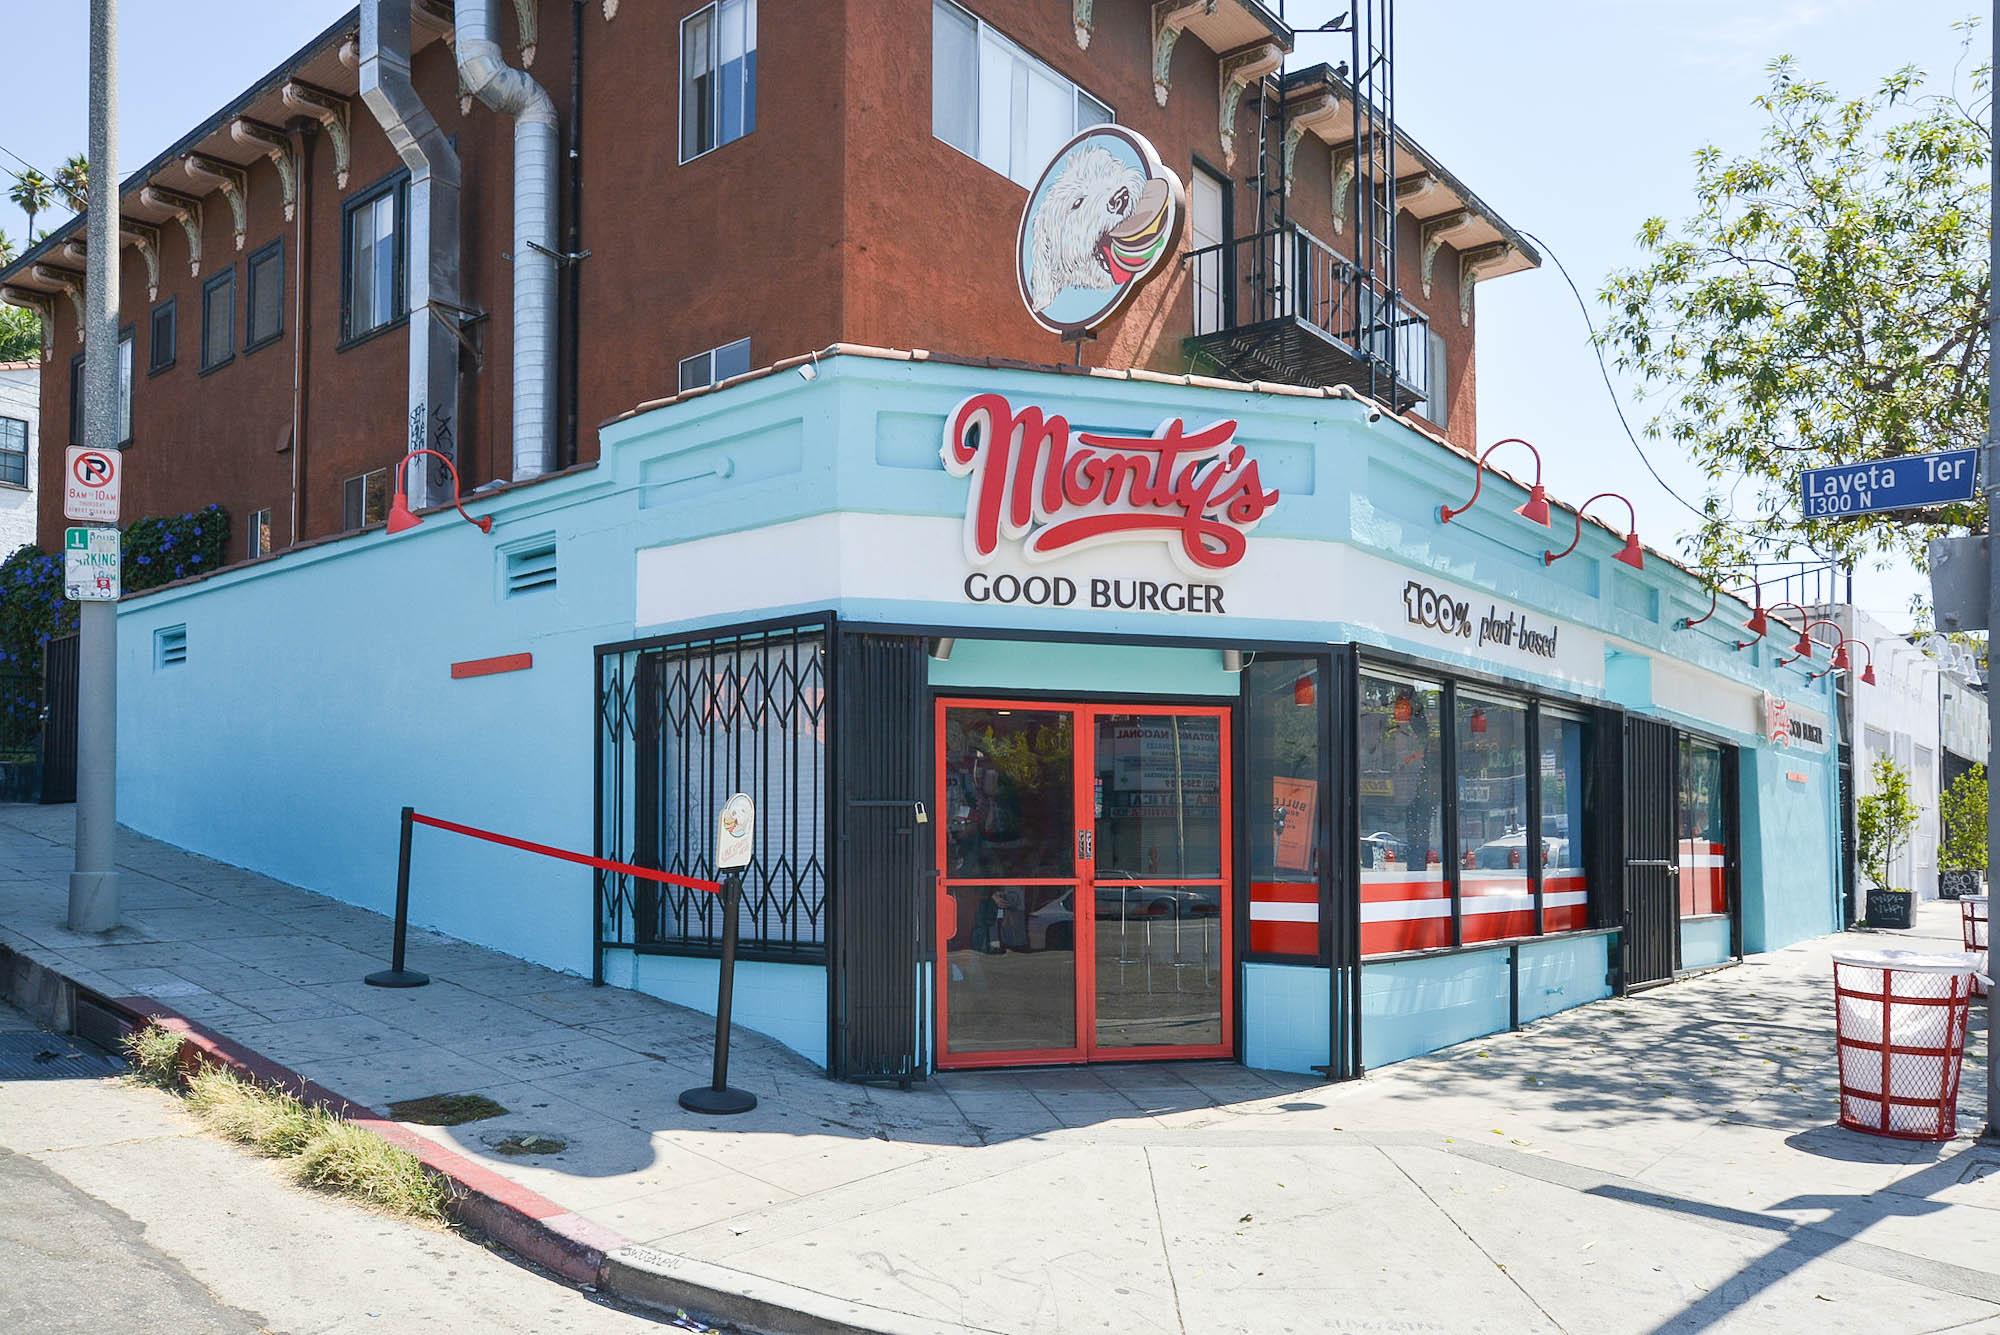 The light blue front door and walls of Monty's Good Burger.